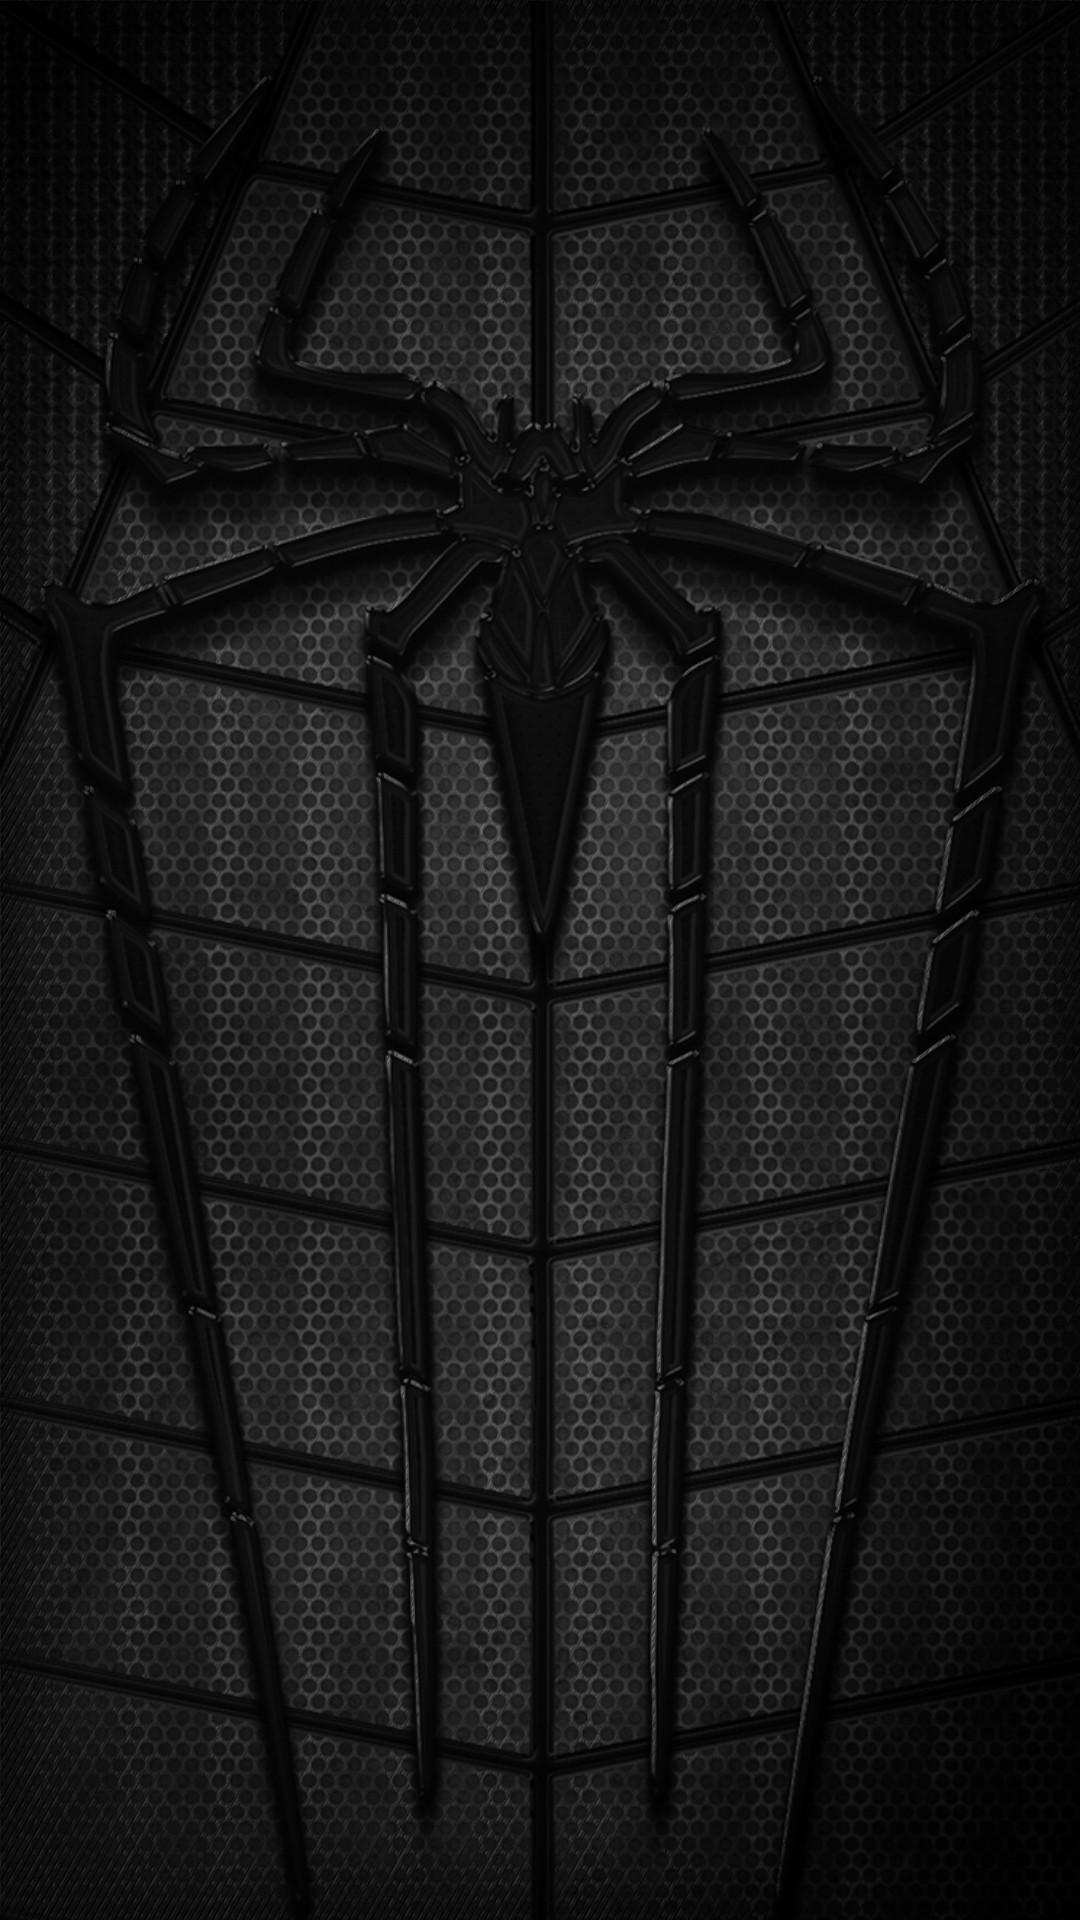 Chicago Bears Iphone X Wallpaper Spiderman Logo Wallpaper 183 ① Wallpapertag